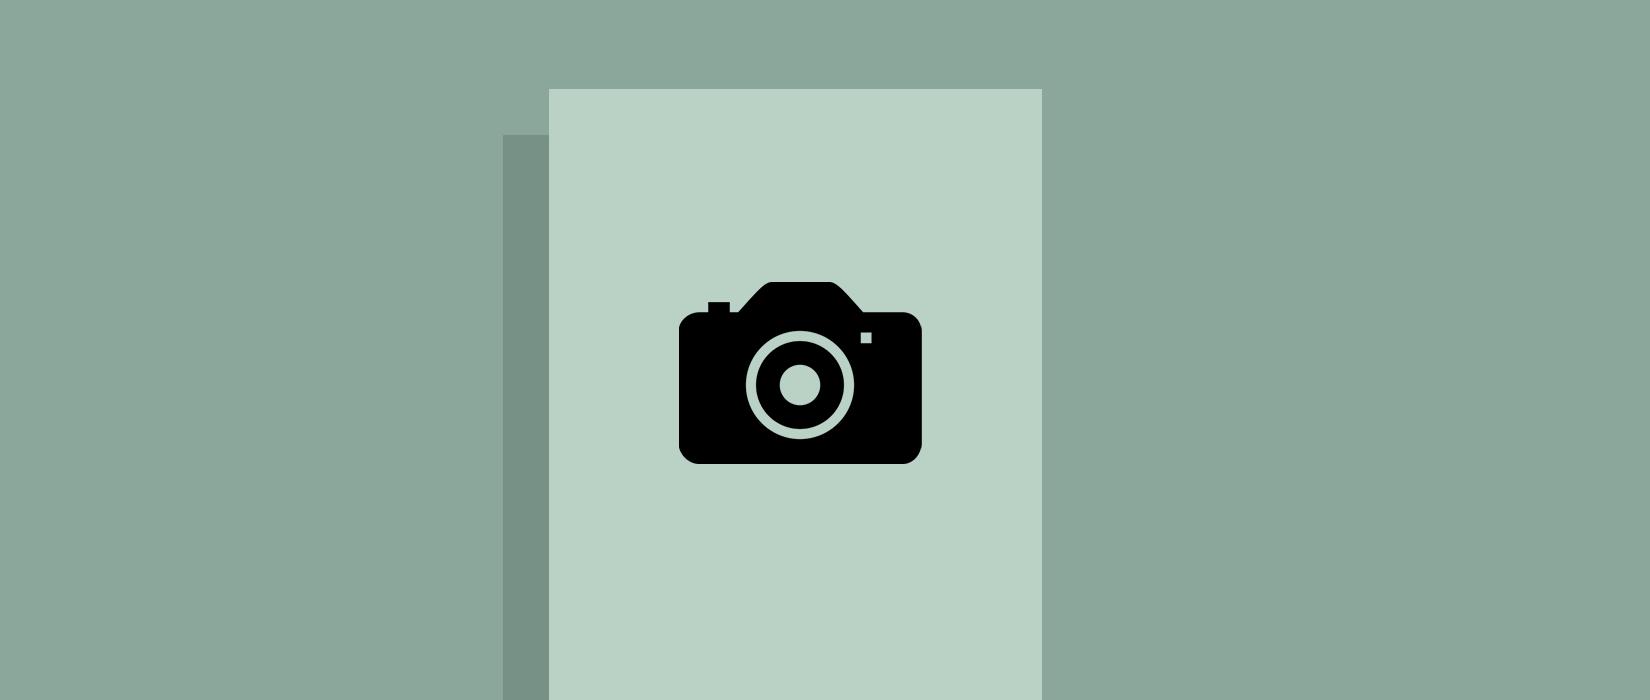 Creating Screenshots with the Ionic Cordova Screenshot Plugin